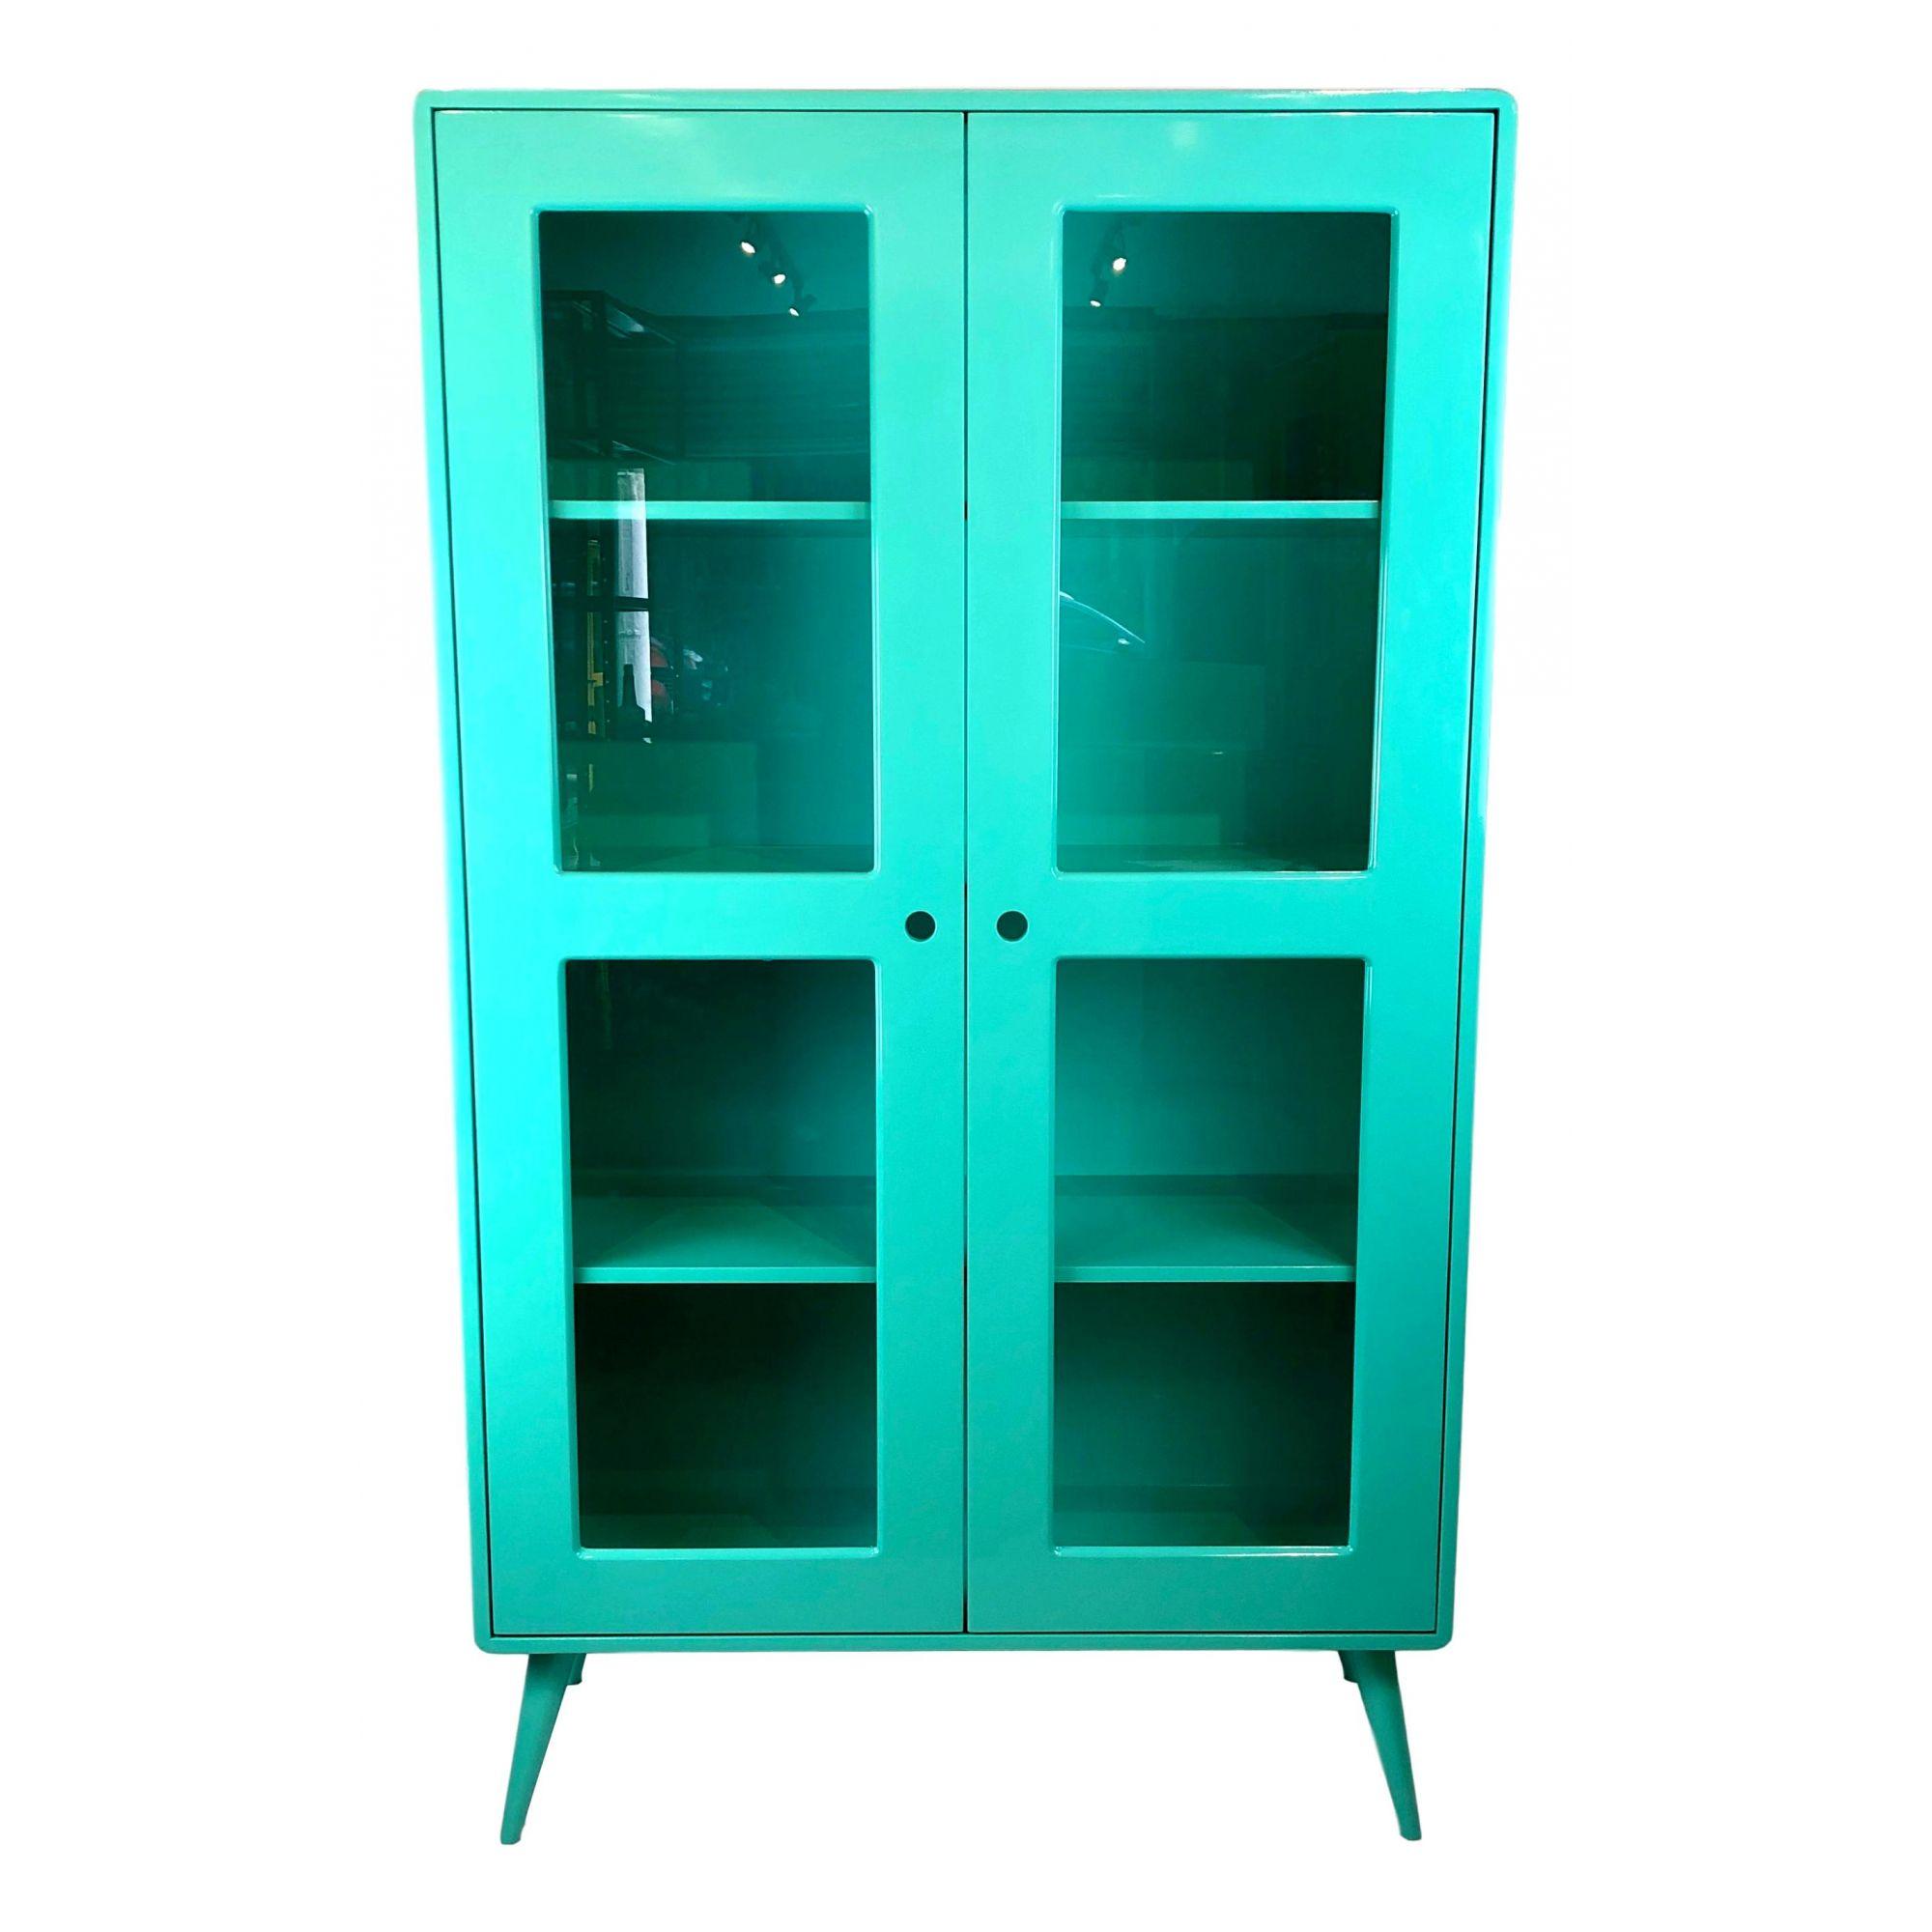 Cristaleira Pé Palito Azul Turquesa 2 portas